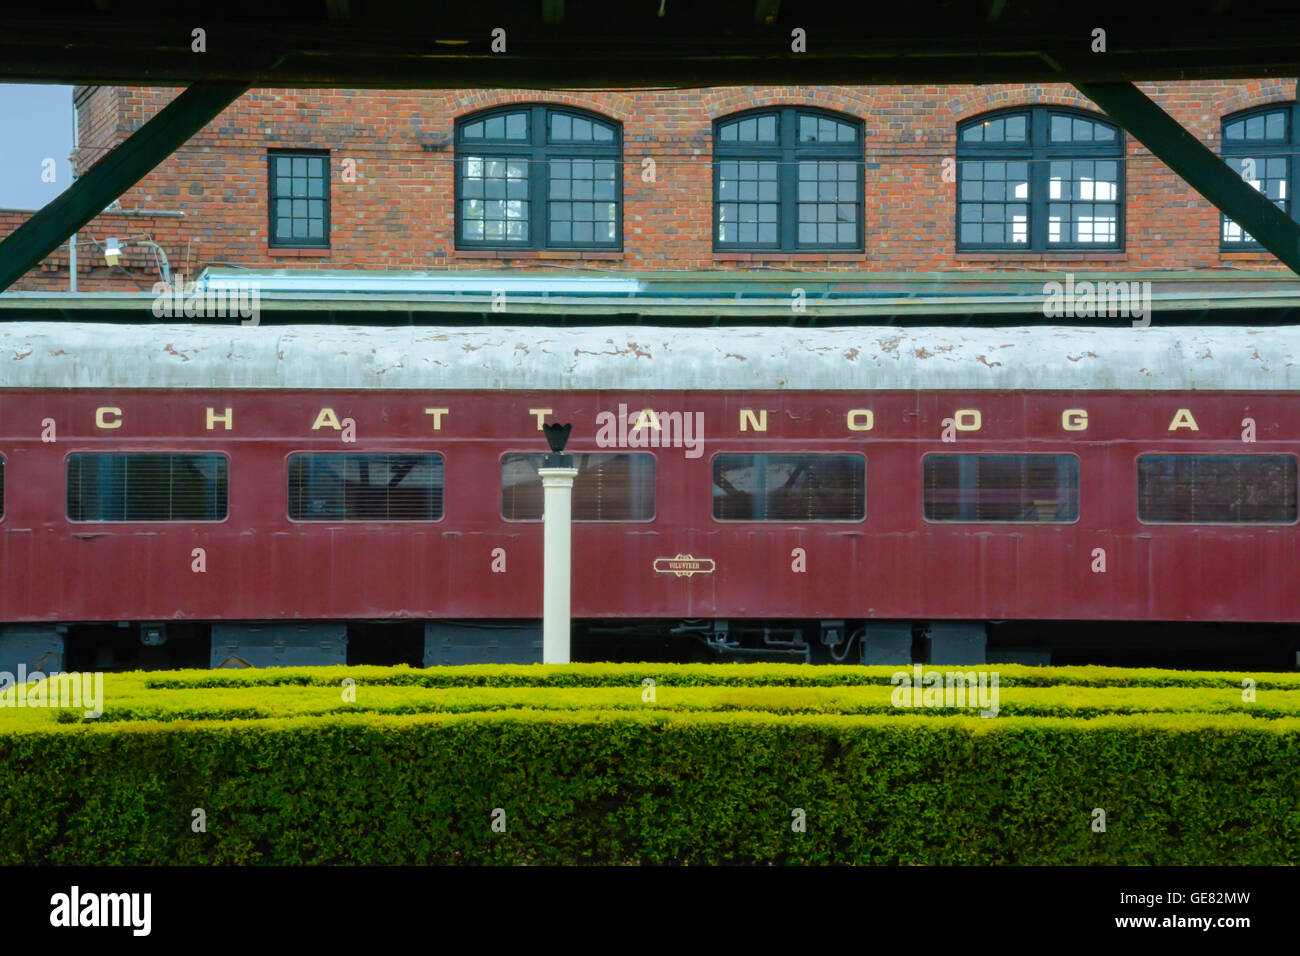 The historical Chattanooga Choo Choo Hotel's vintage branded passenger train car on tracks along side the garden - Stock Image